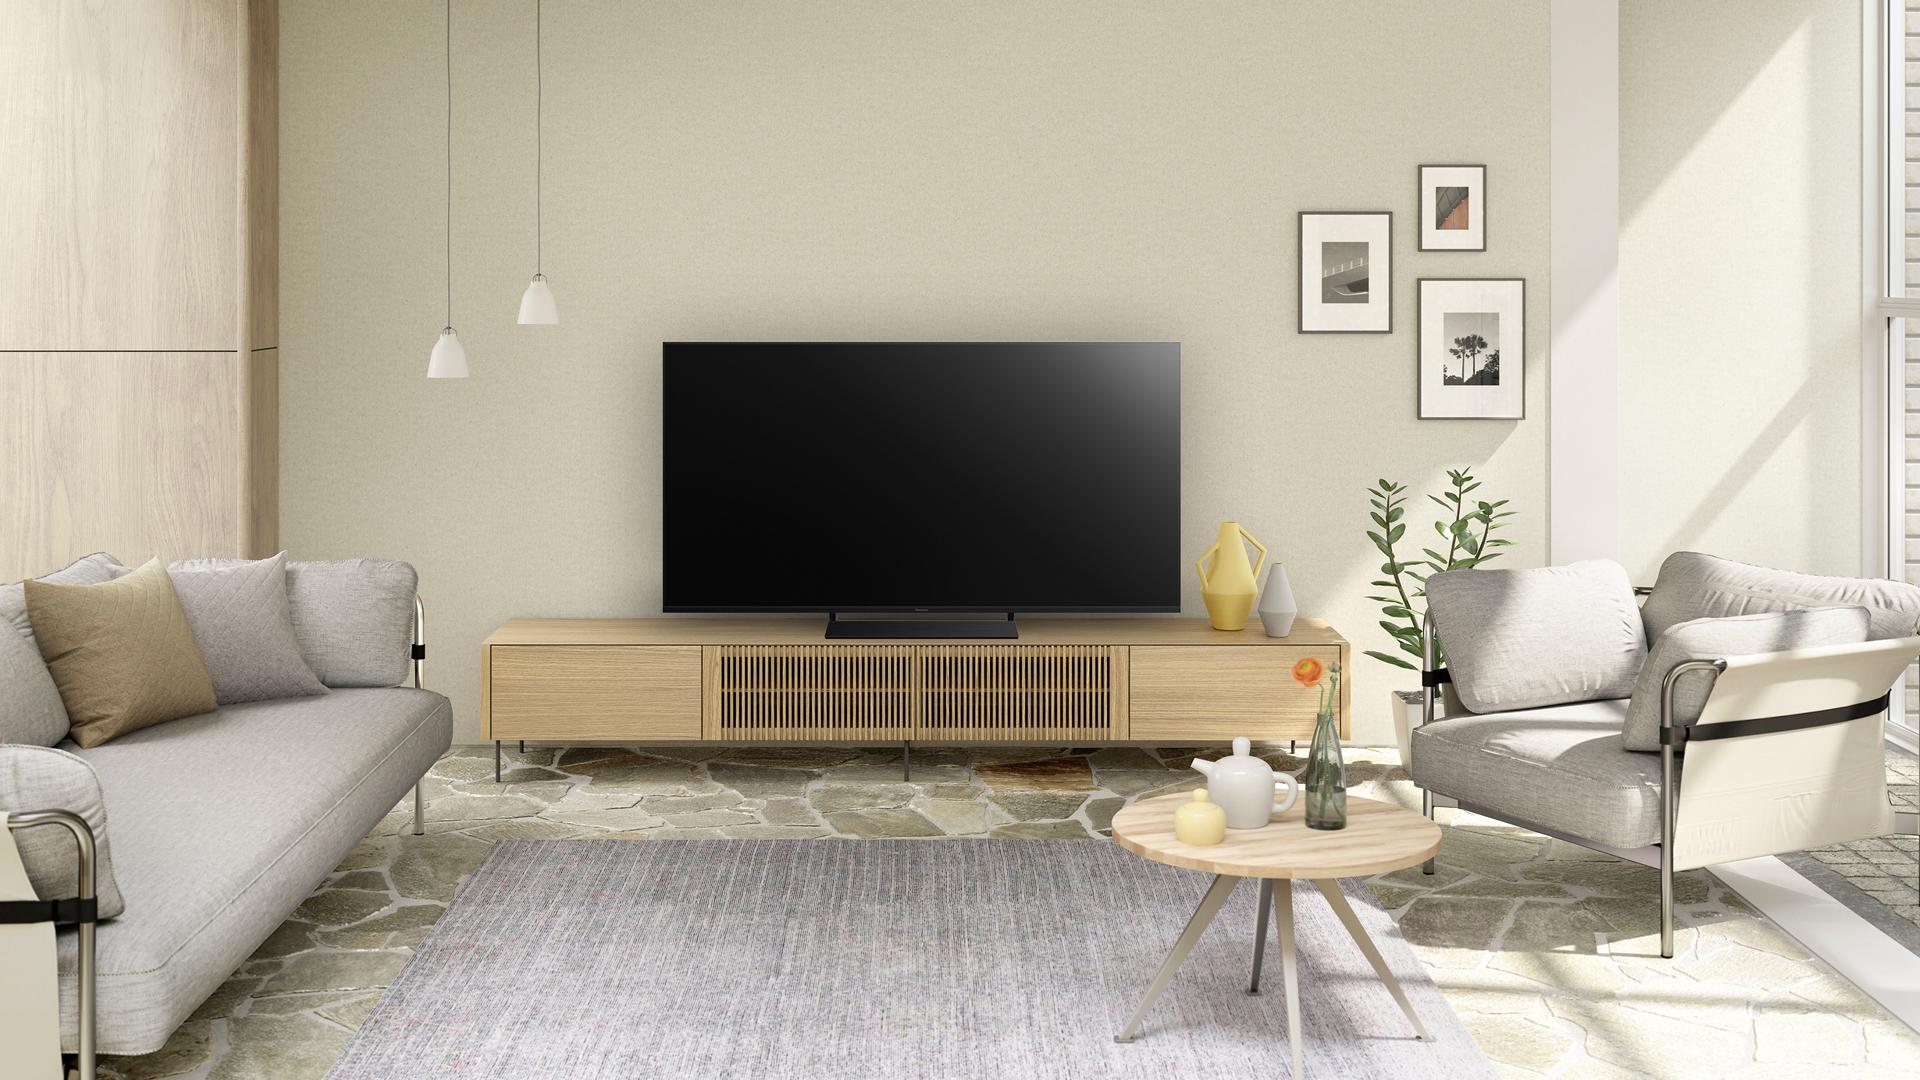 Panasonic Hx800 Tv Review Techradar